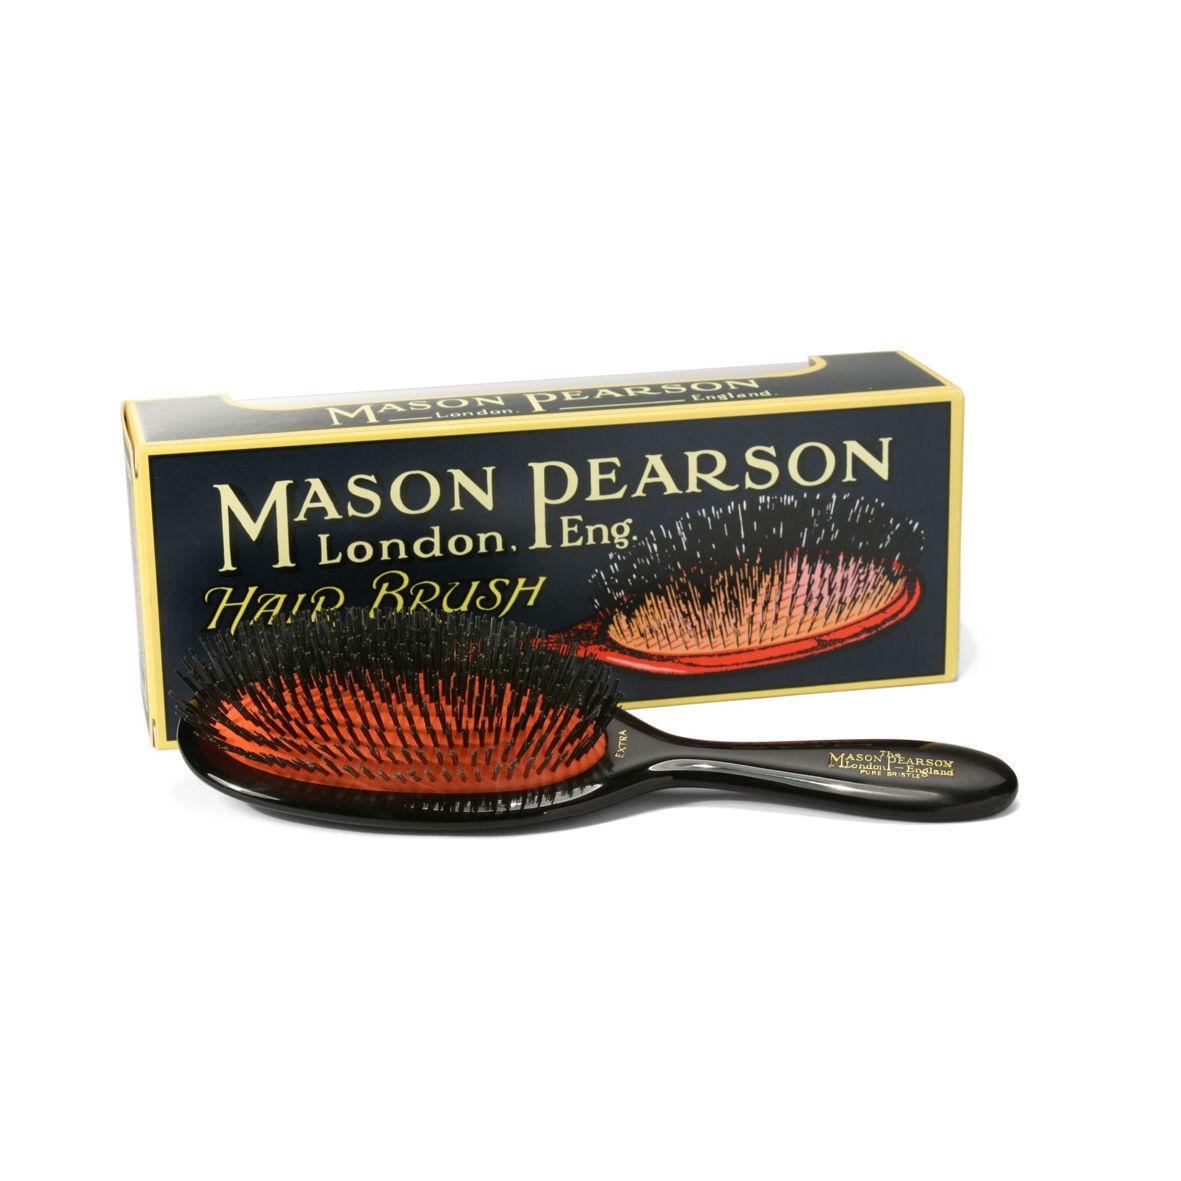 Mason Pearson large extra bristle Brush